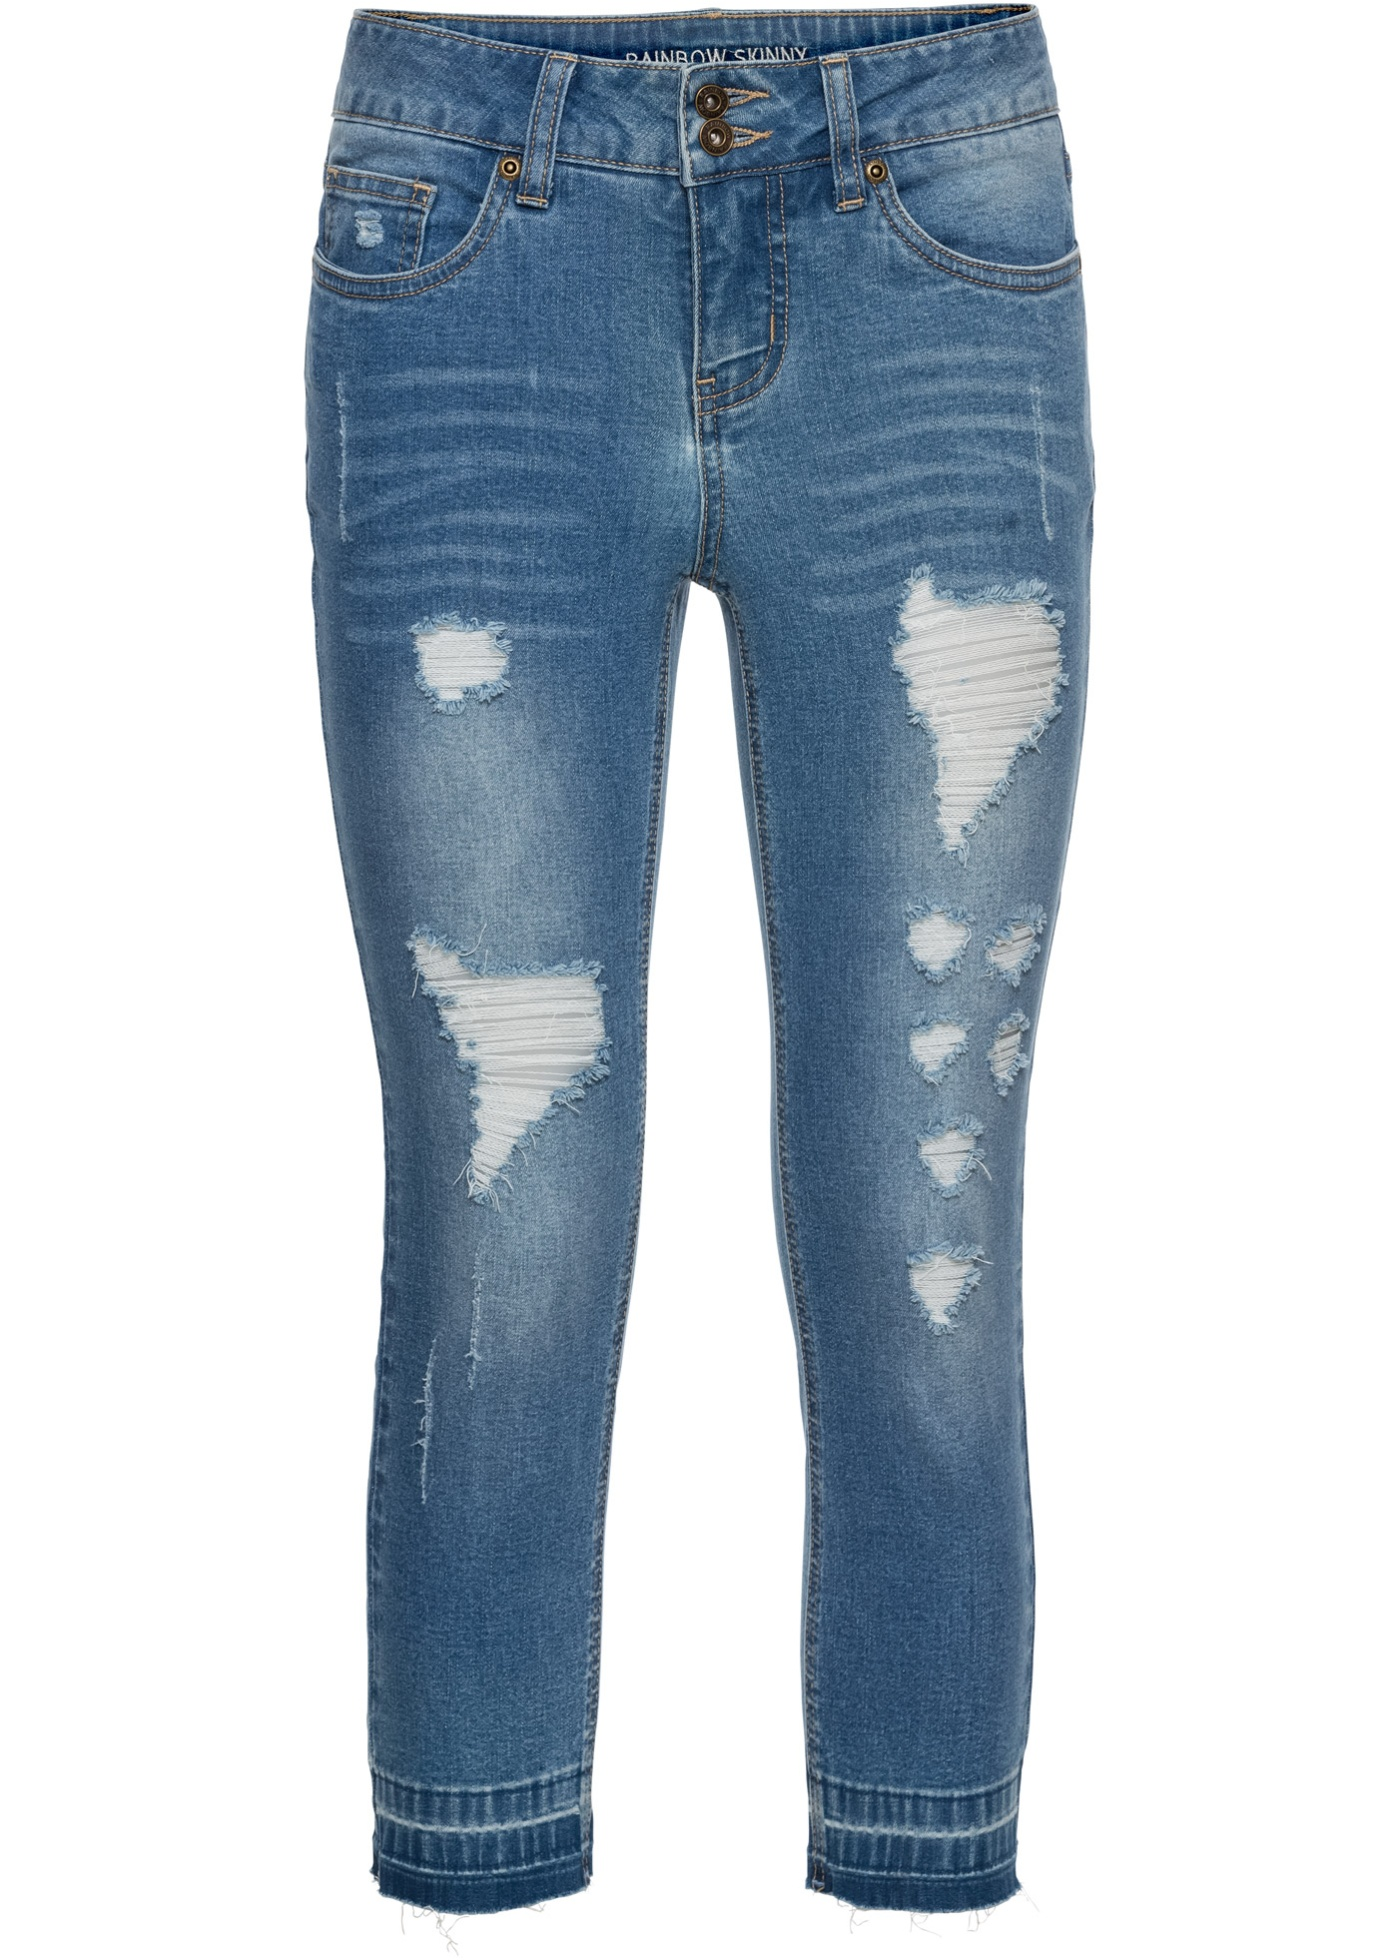 4 Femme Bleu Rainbow 3 Skinny Pour BonprixJean Longueur lTJKcF1